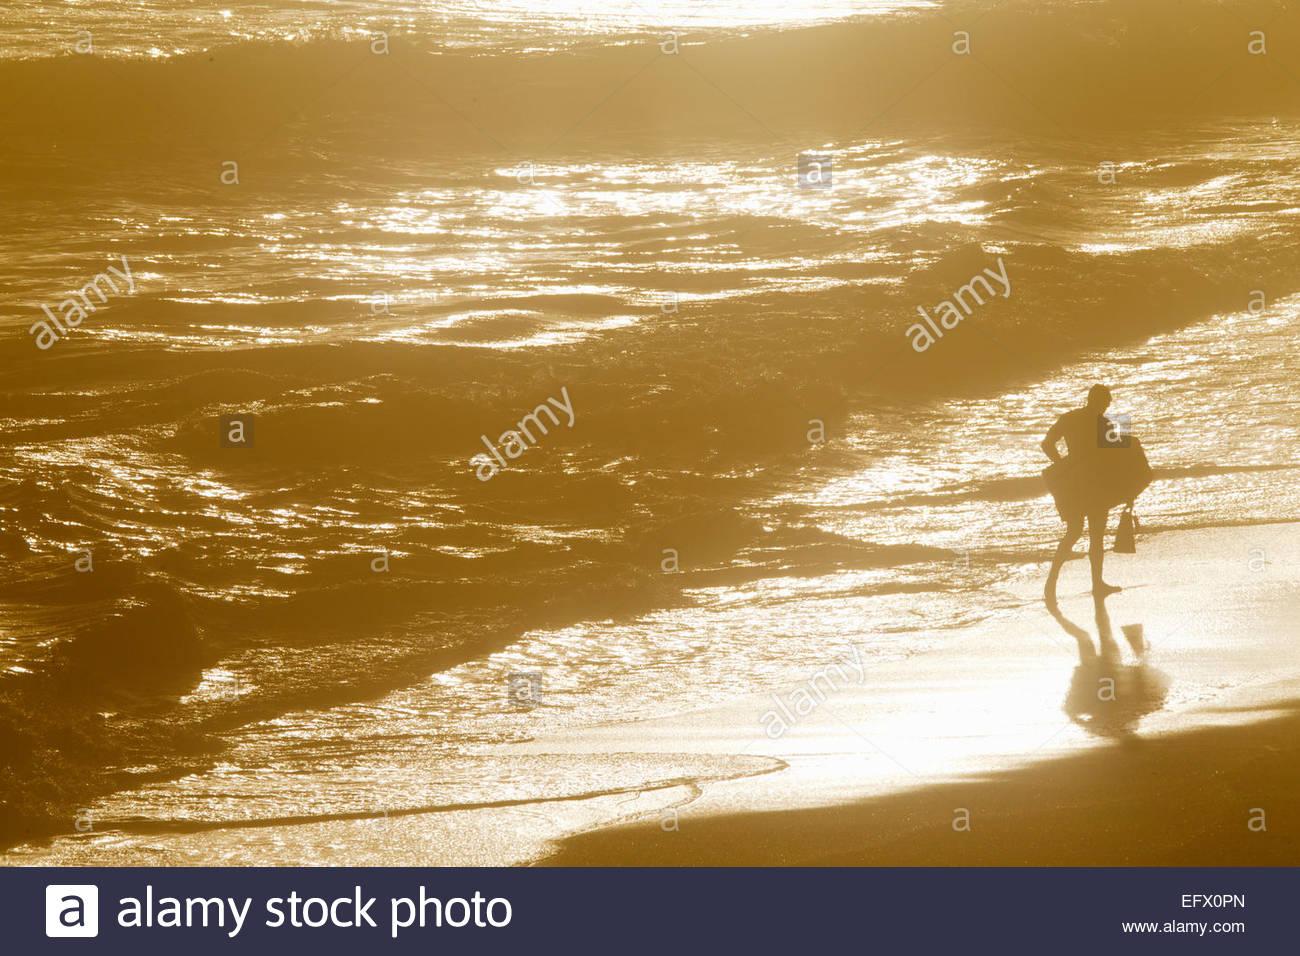 Man holding body board walking along beach through waves - Stock Image